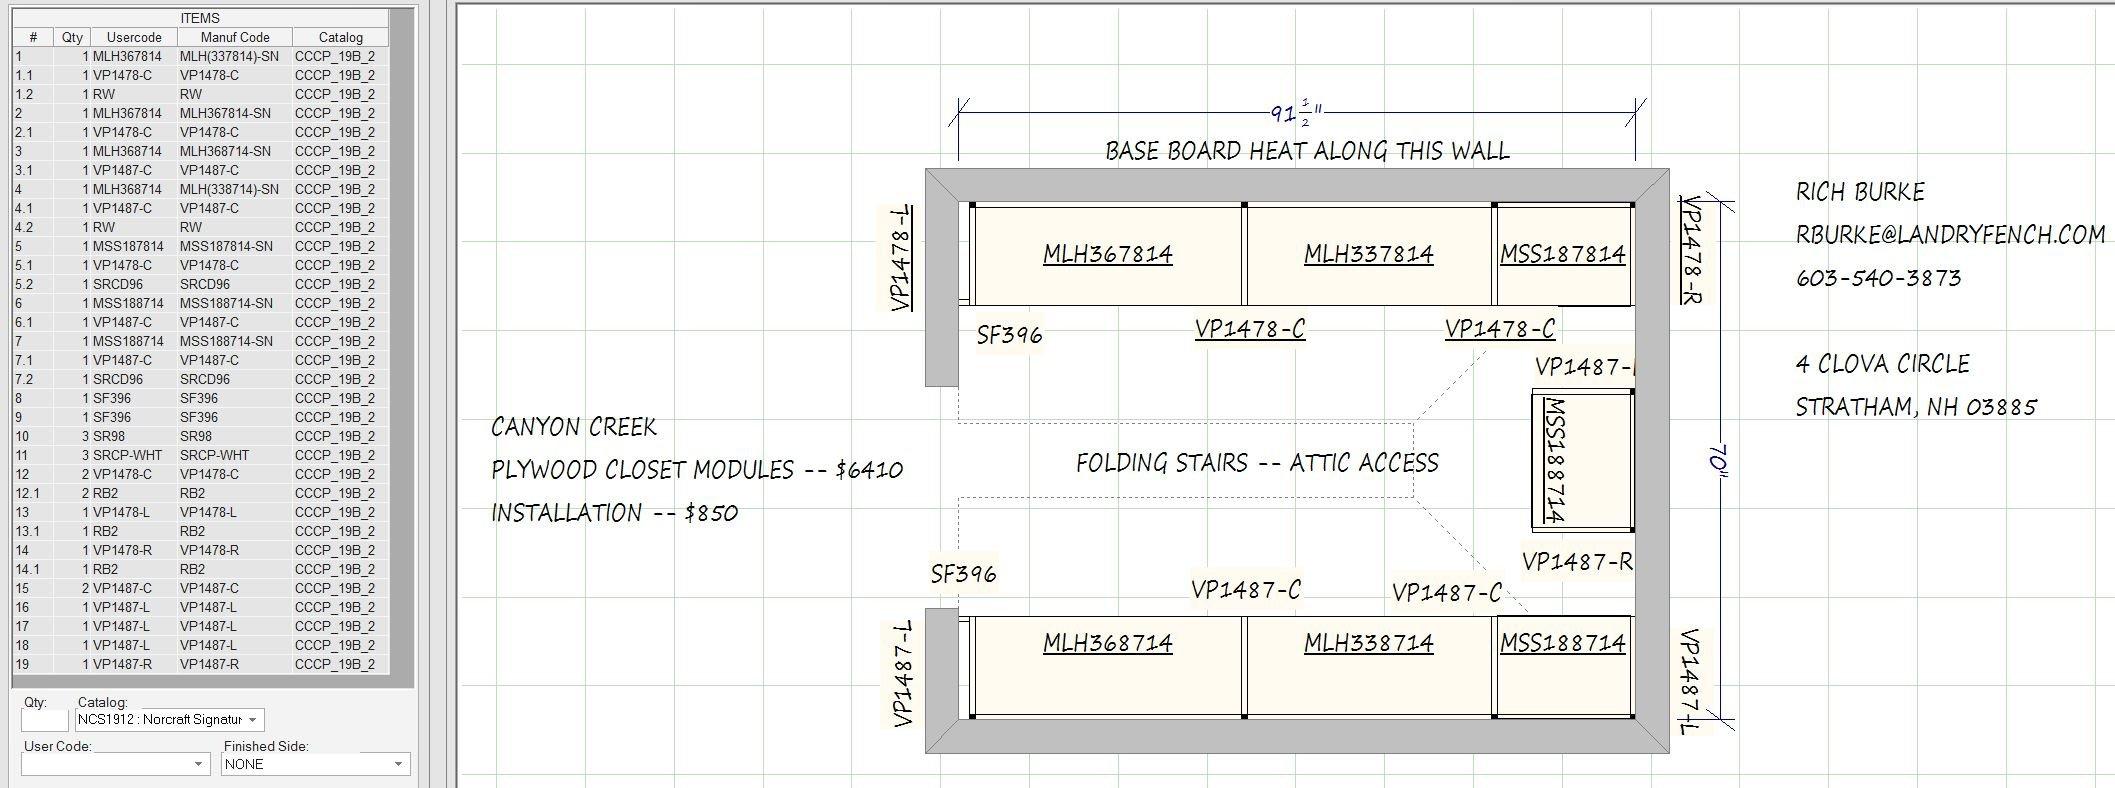 Parts List Floor Plan and Estimate